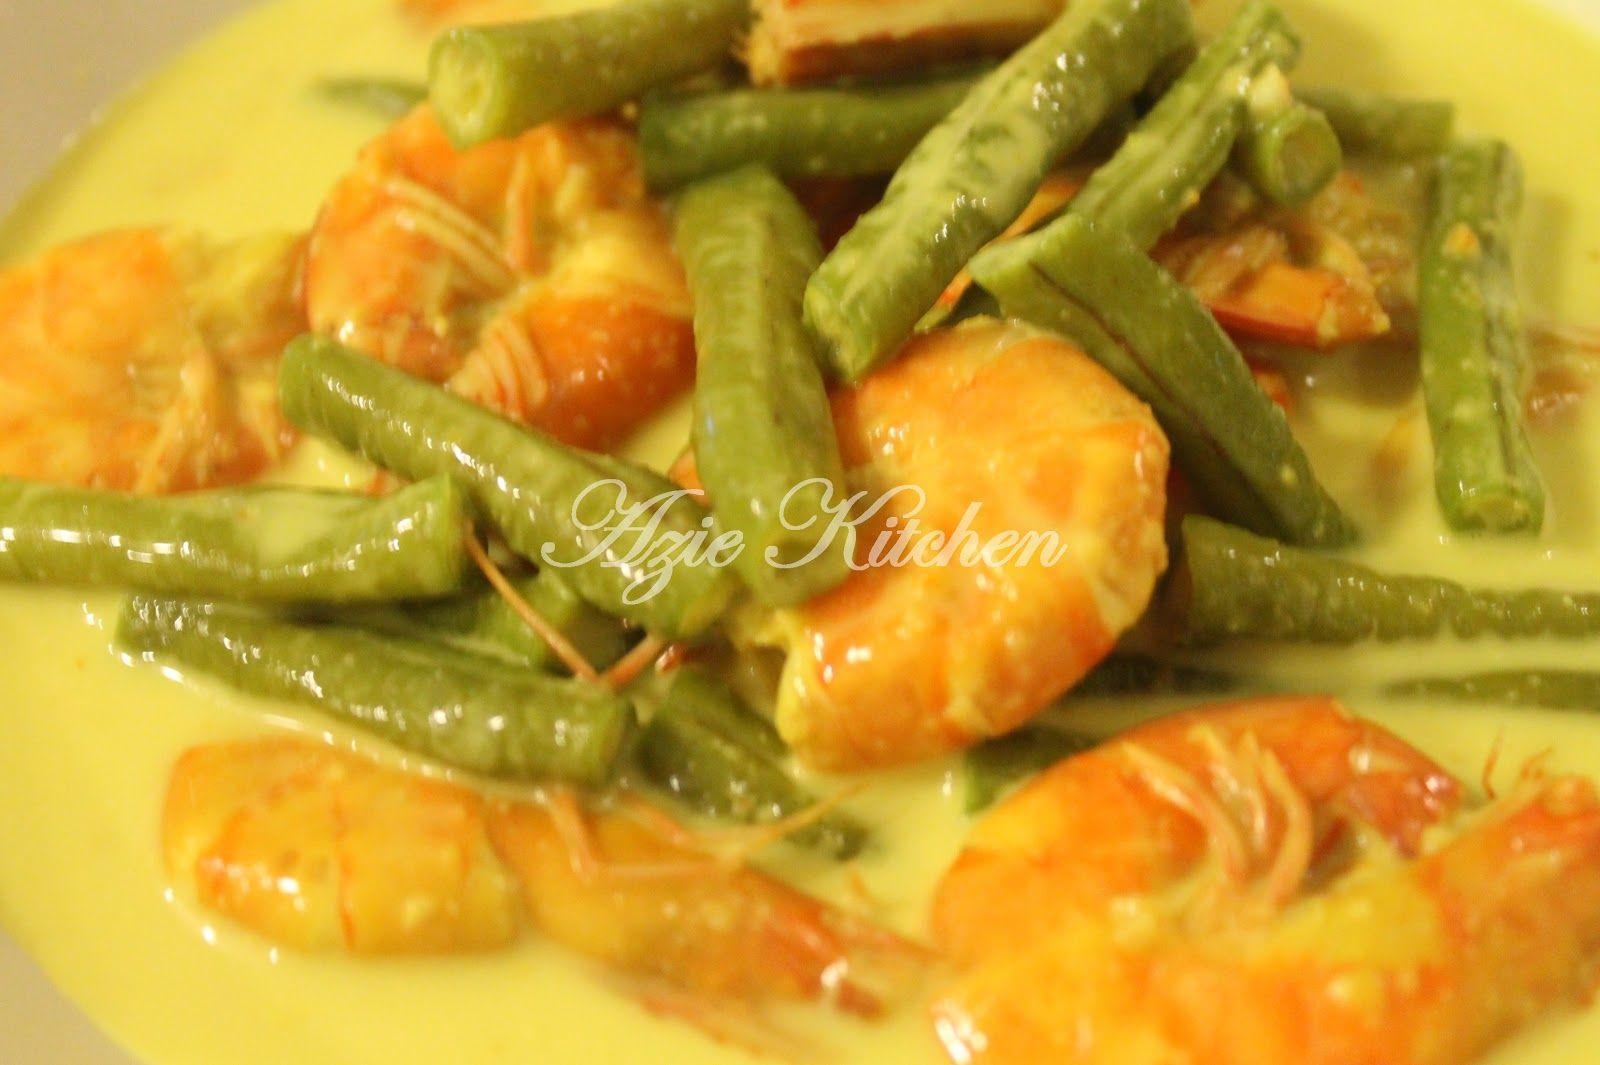 Azie Kitchen Masak Lemak Cili Padi Udang Dan Kacang Panjang Masakan Sayuran Kacang